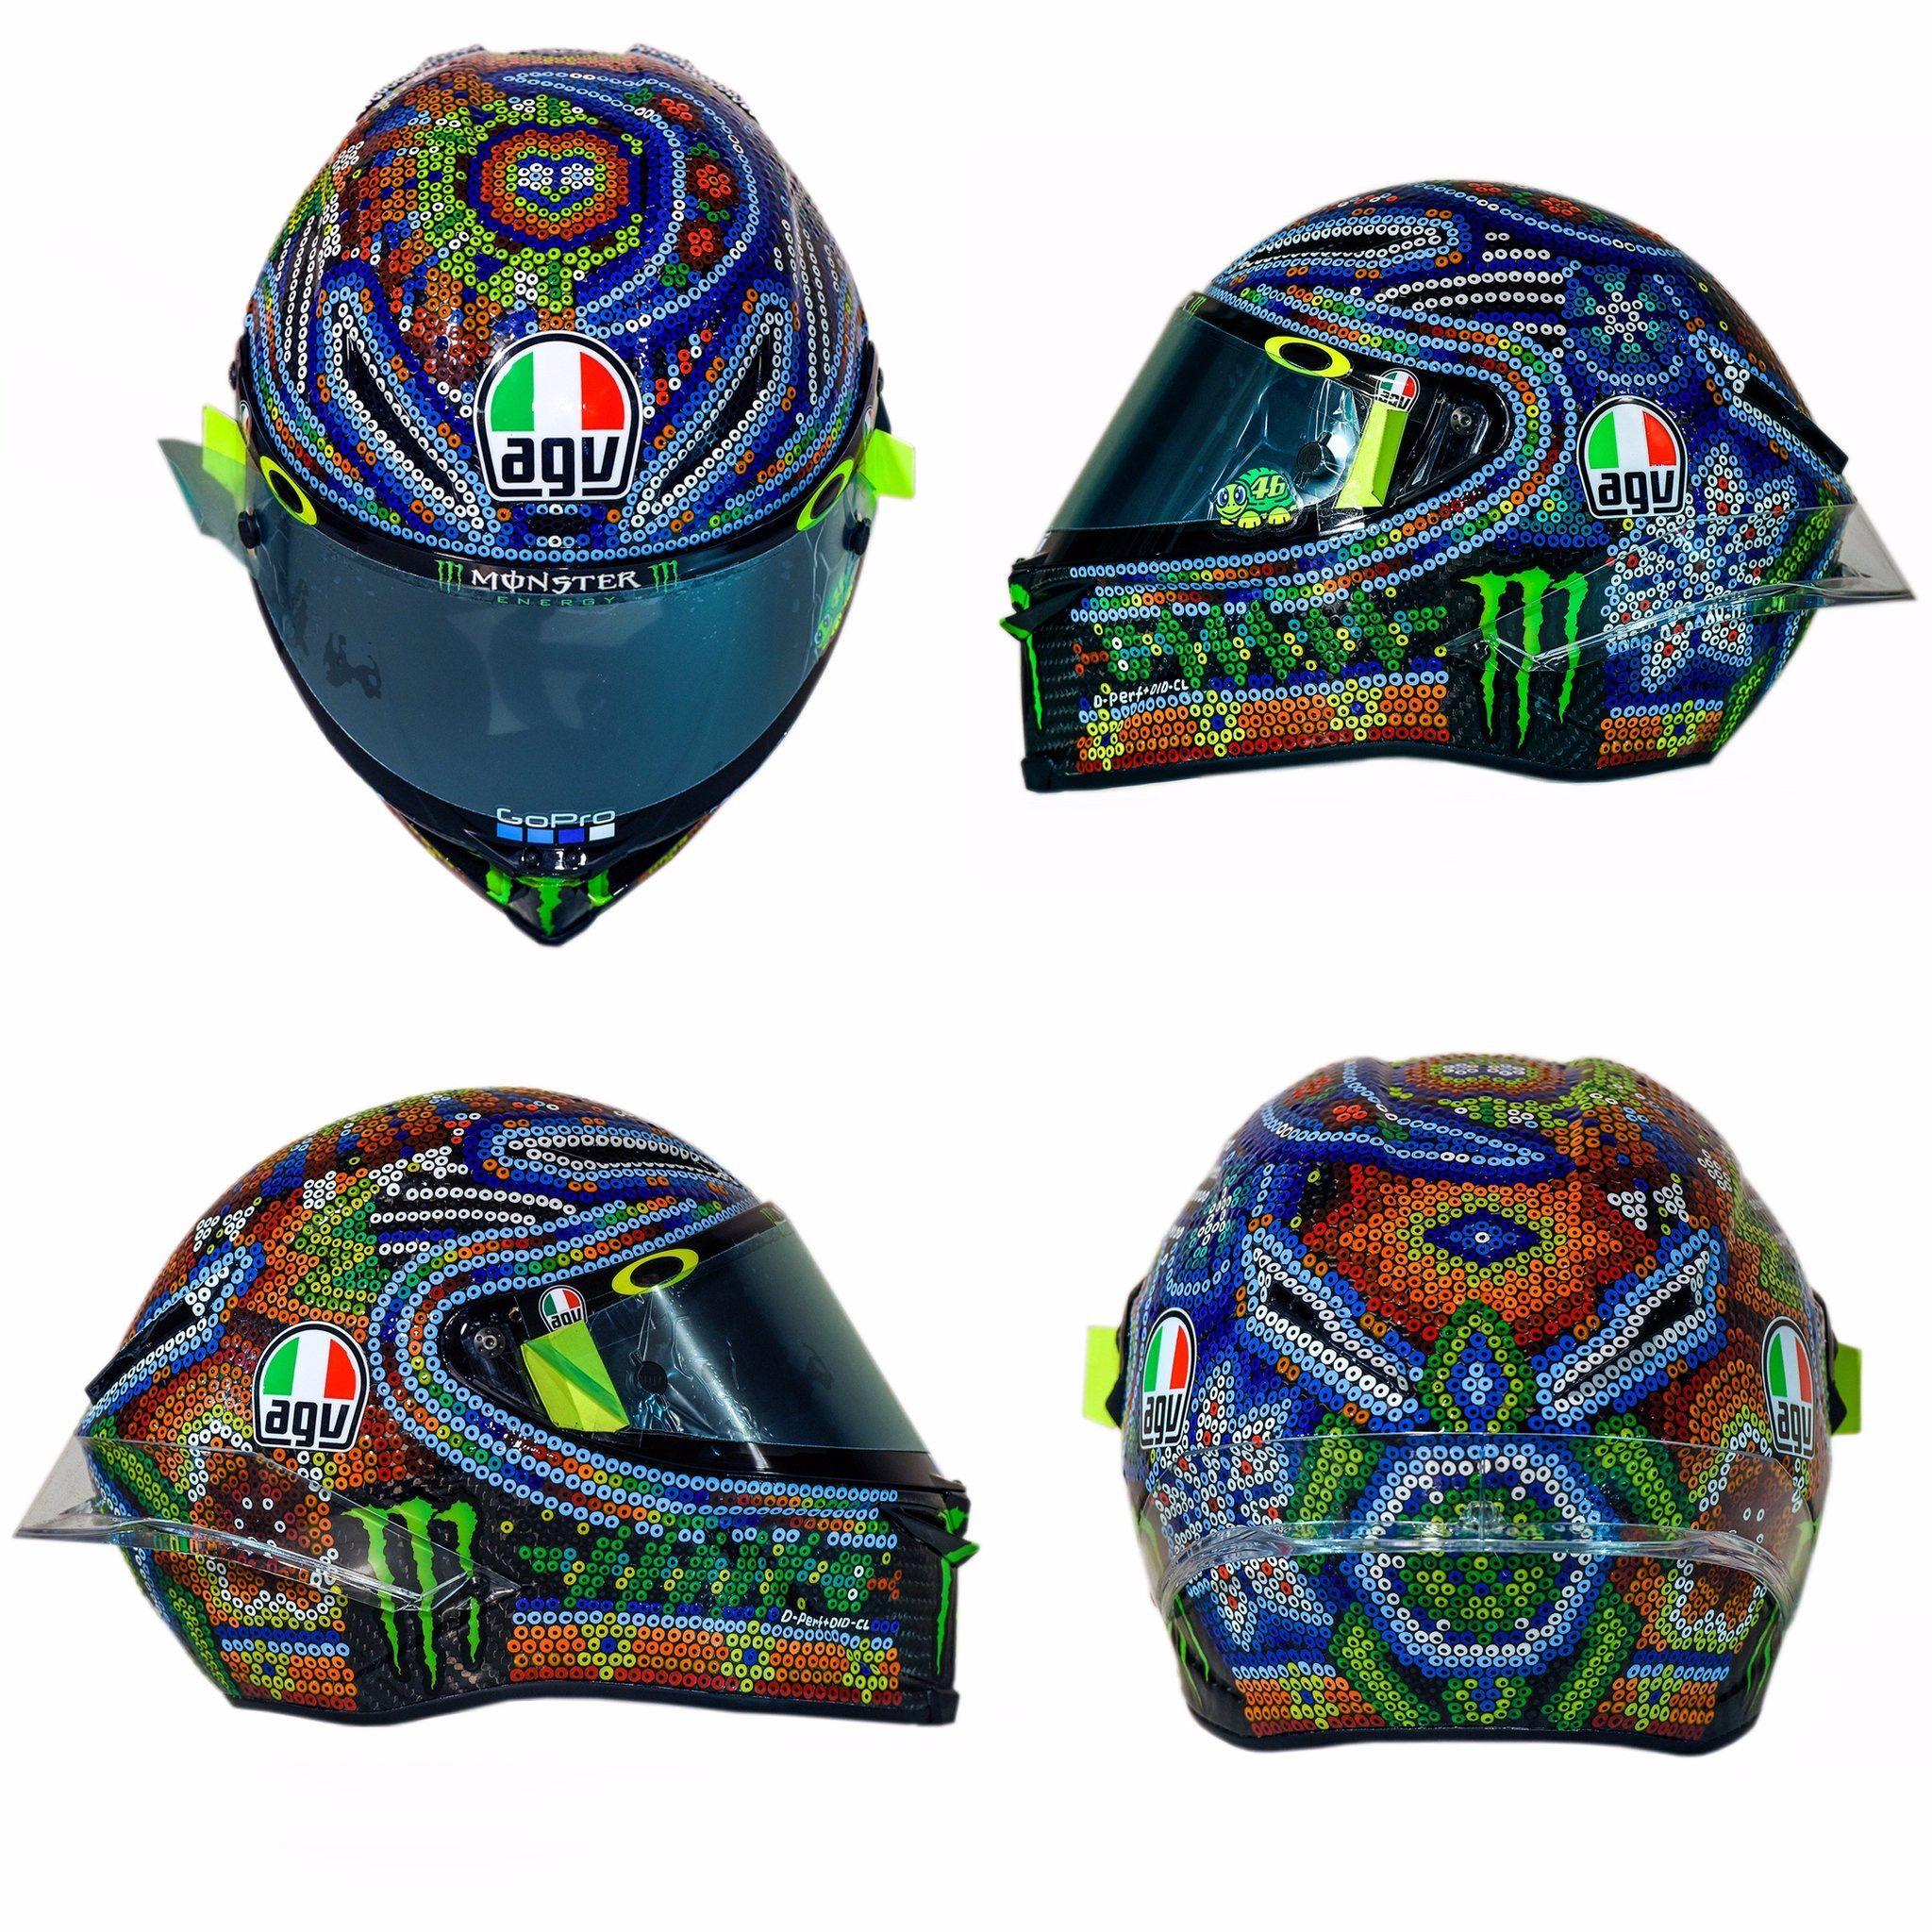 Vr46 winter test helmet for 2018 edition love it 💕 vr46 thegoat